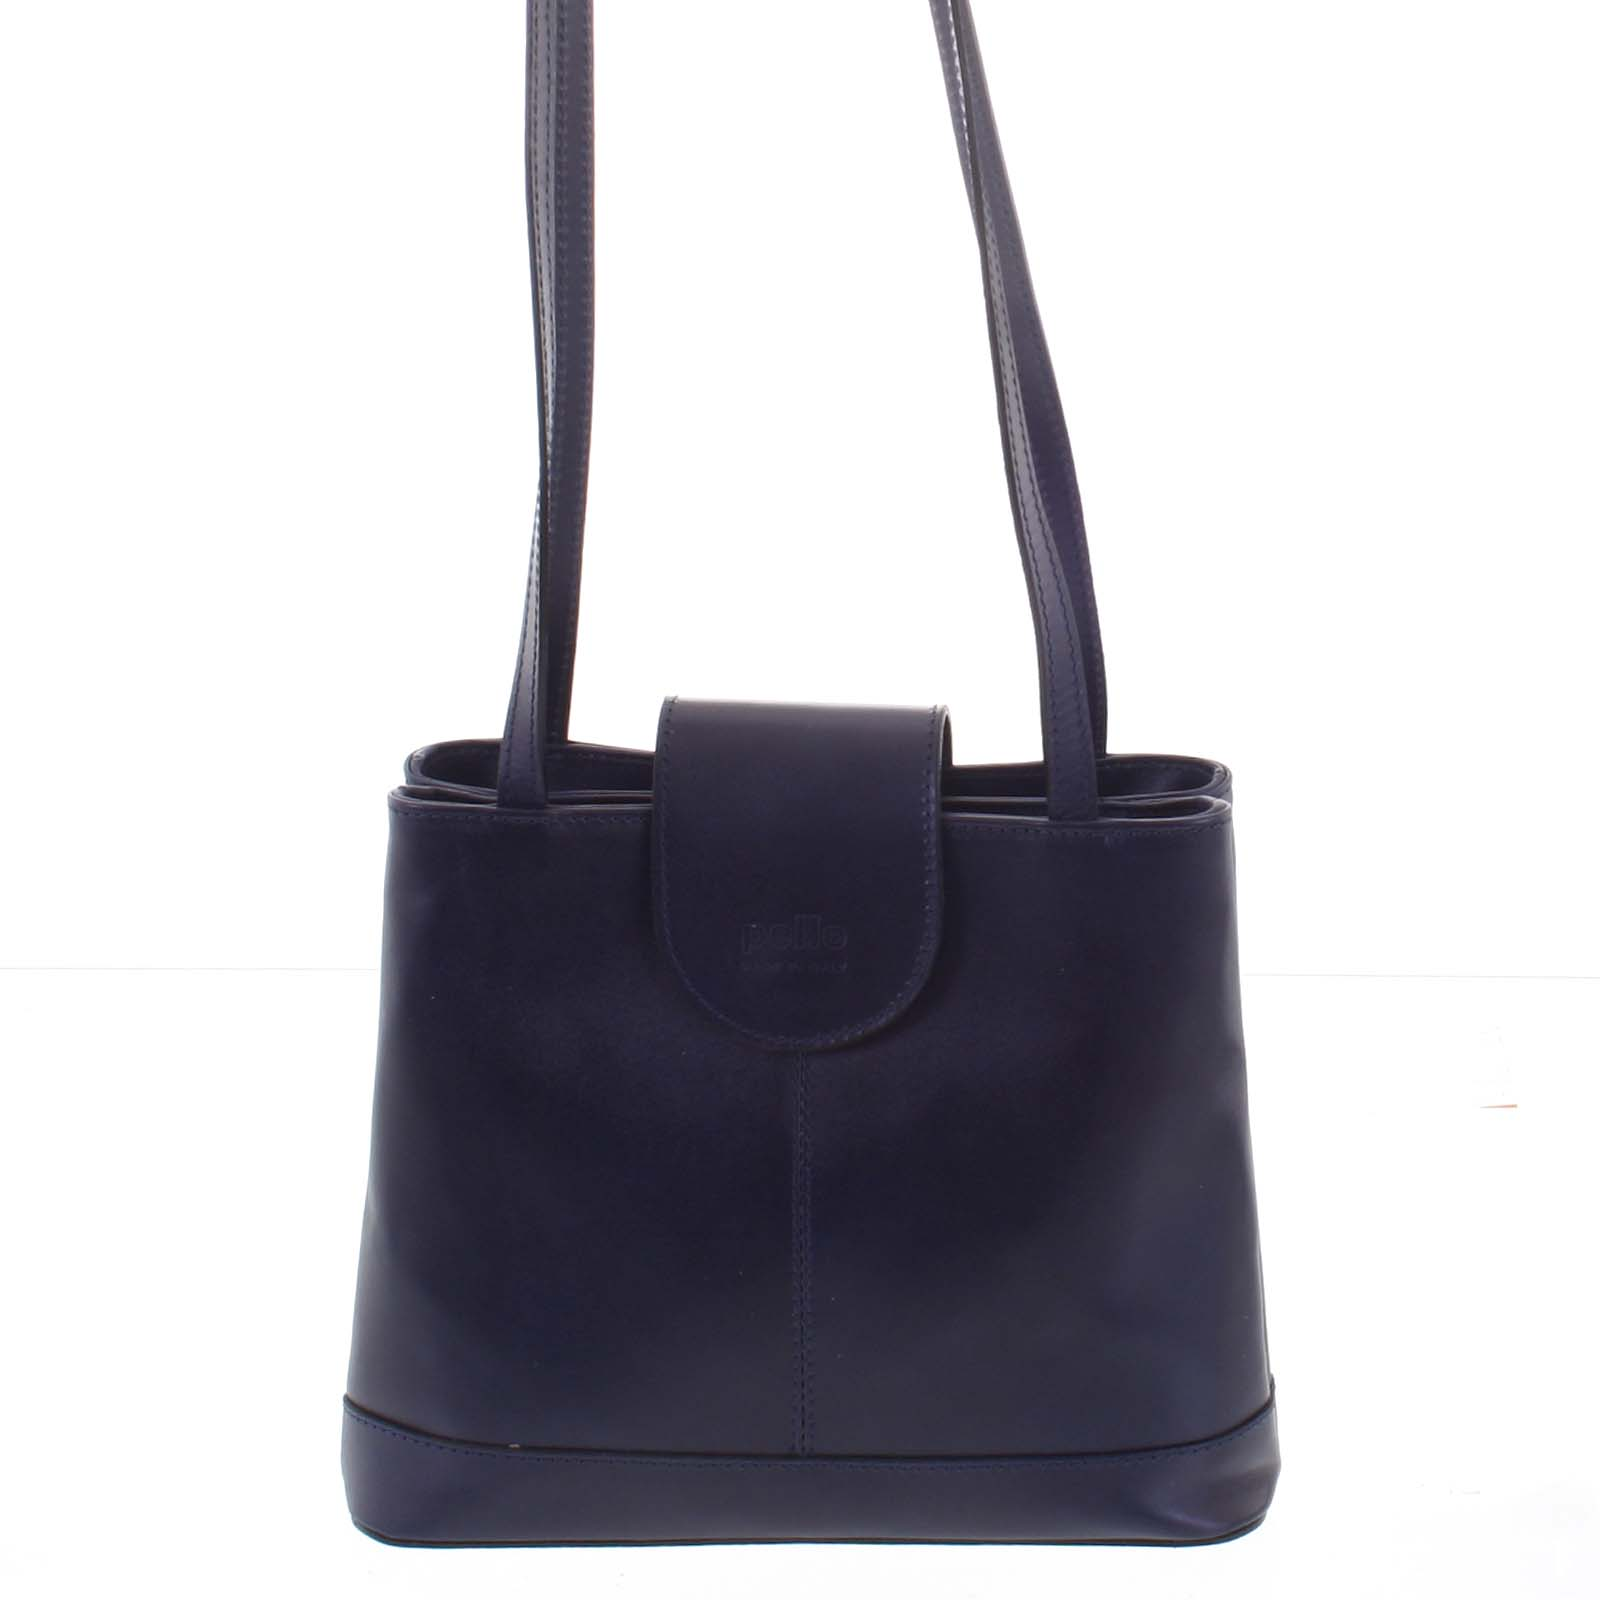 Kožená dámska tmavo modrá kabelka cez rameno - ItalY Zenna modrá